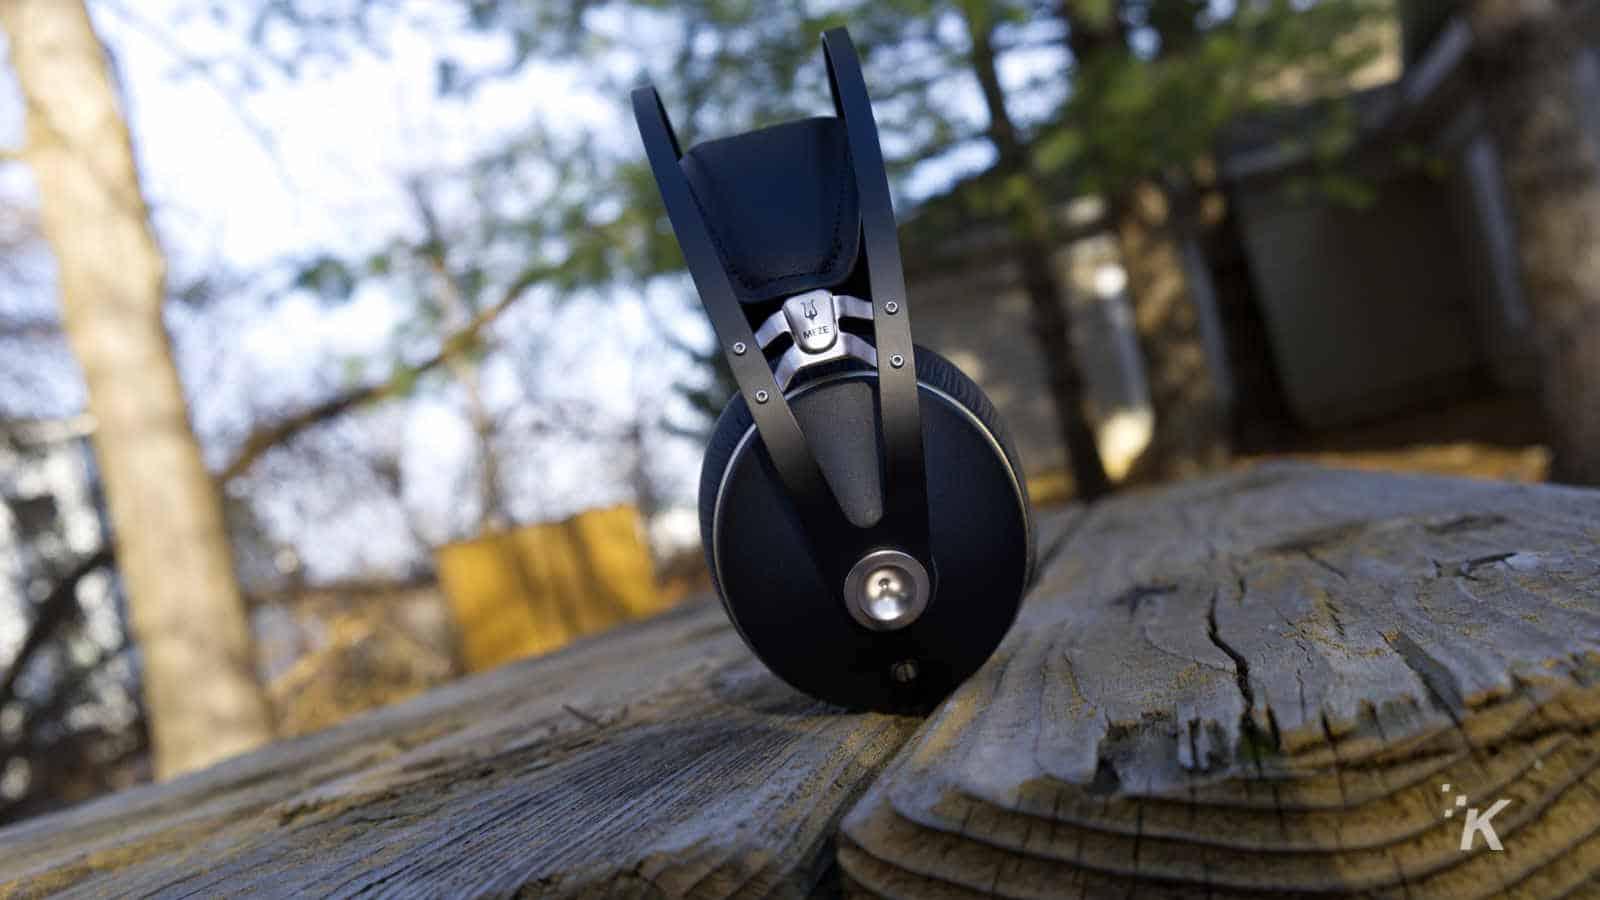 meze headphones on table